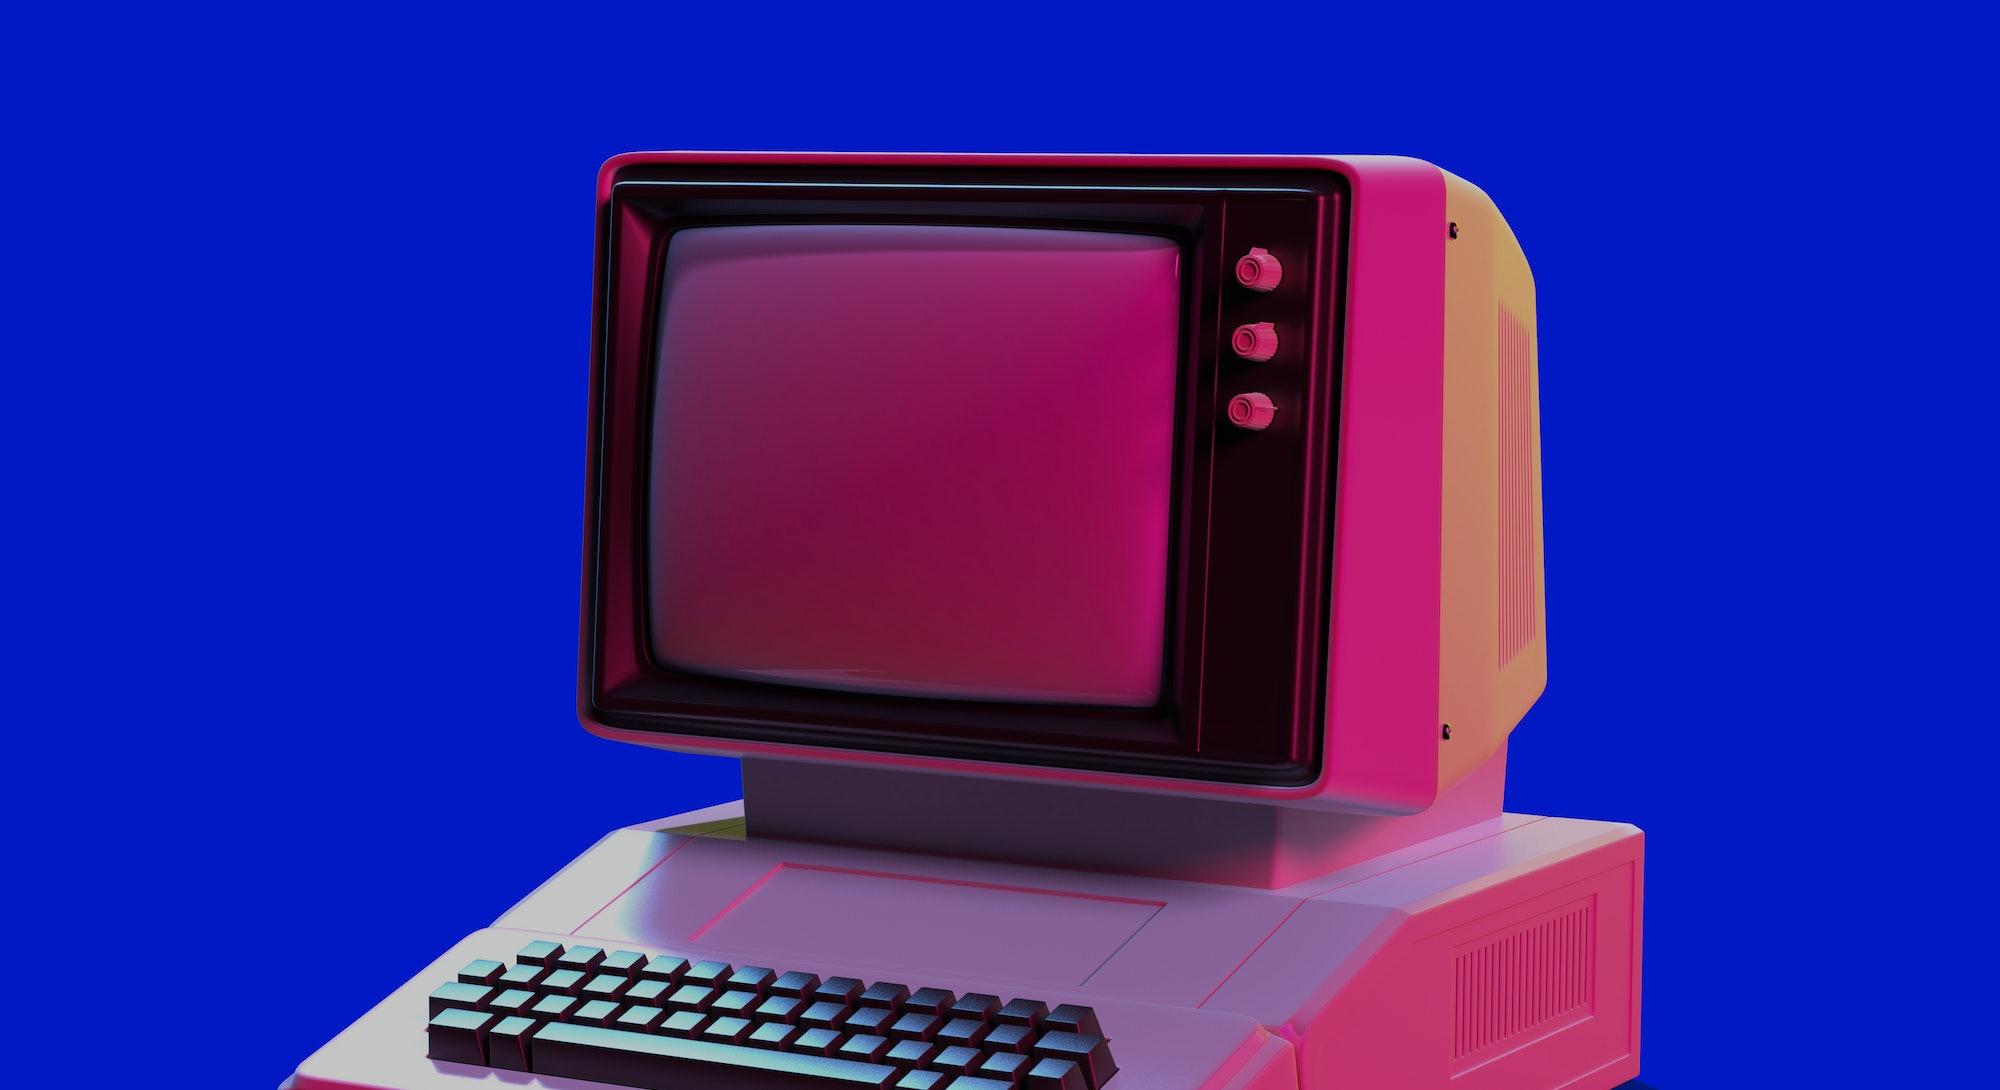 Retro 80s-style computer.